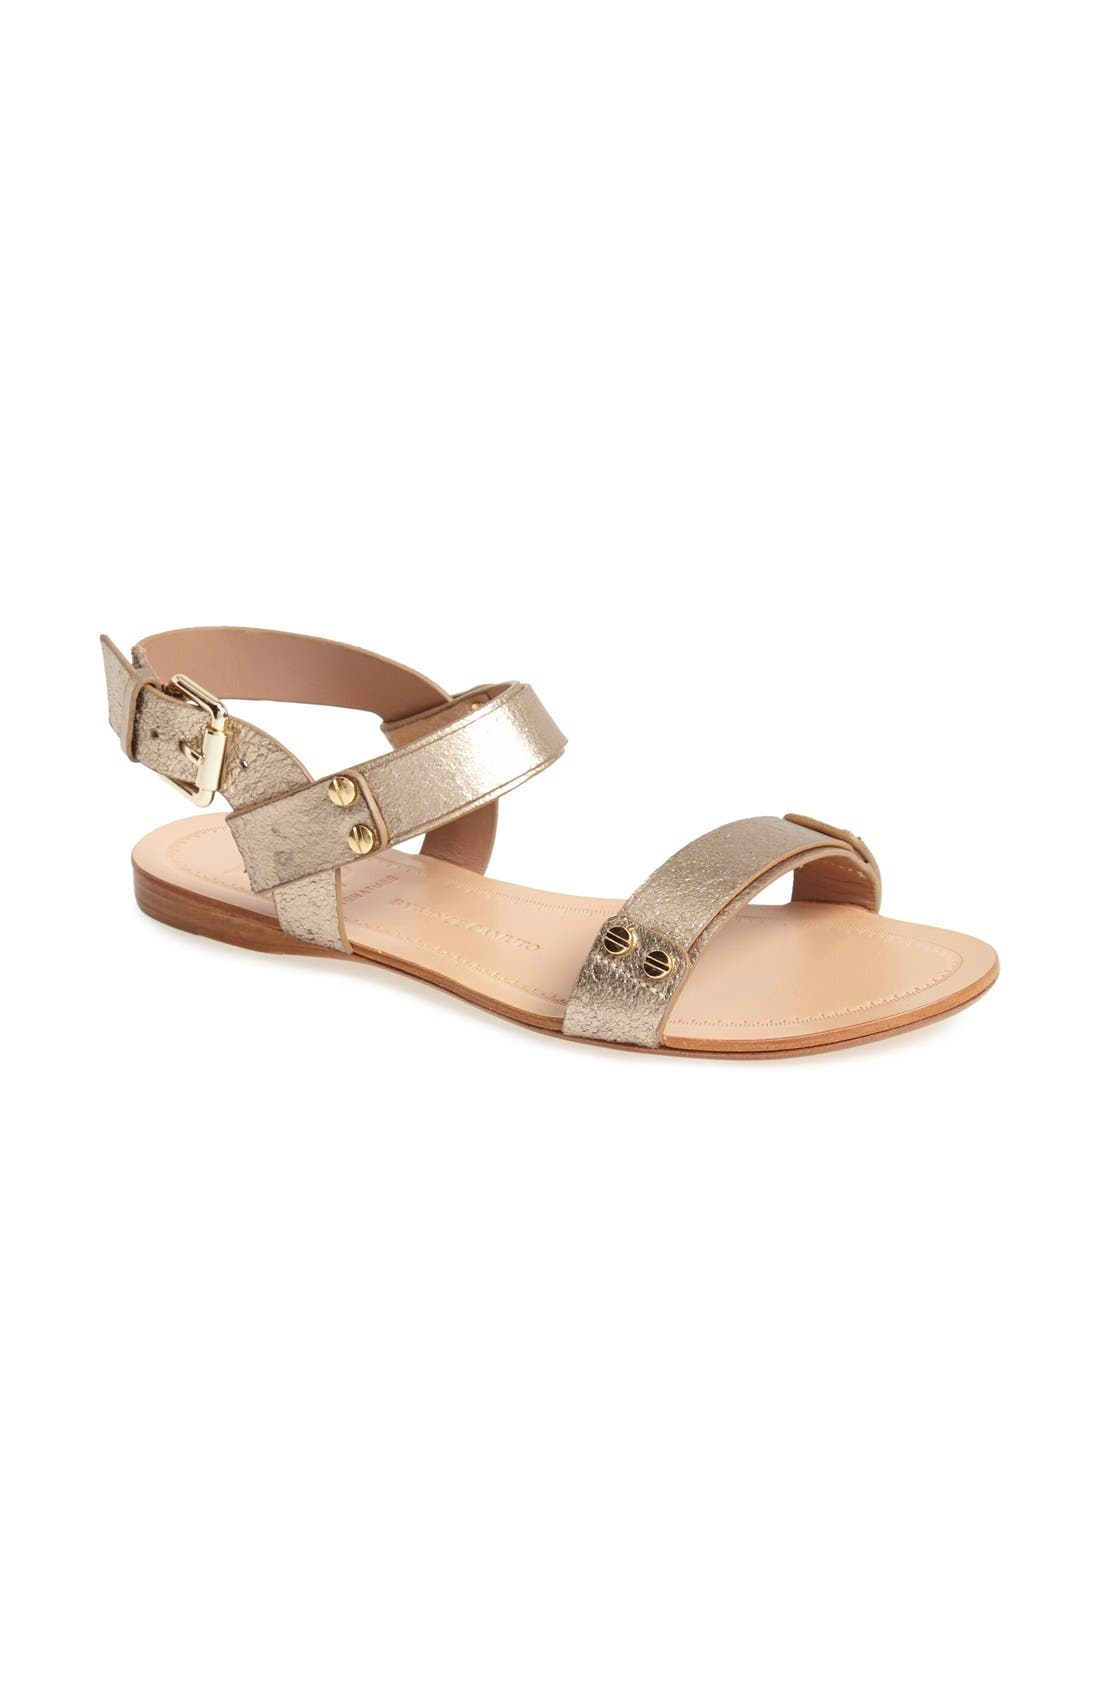 Alternate Image 1 Selected - VC Signature 'Magnoliah' Leather Sandal (Women)